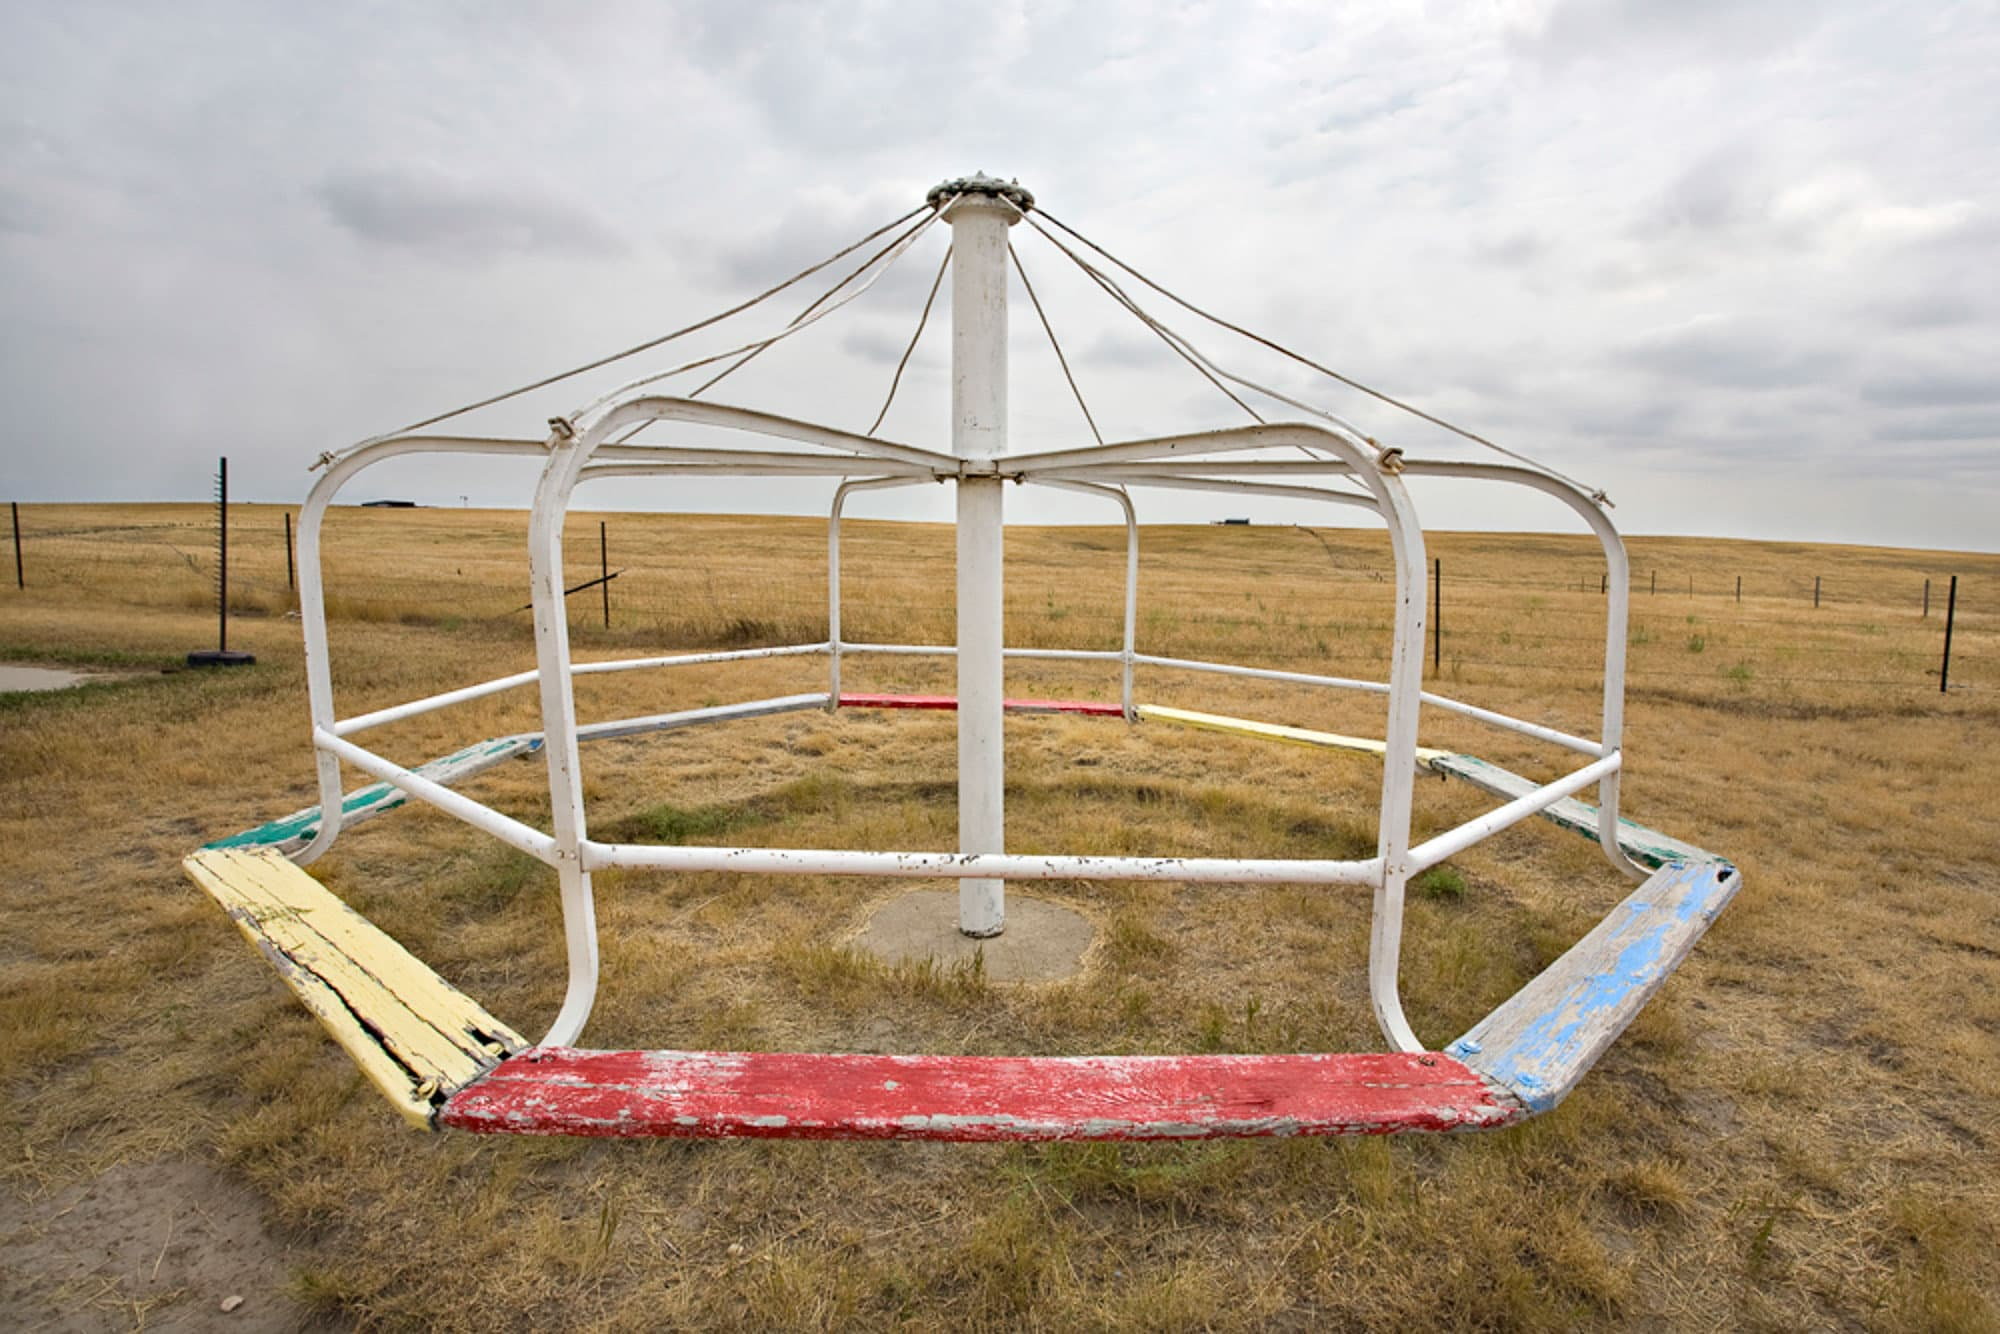 arthur-lazar-Merry-Go-Round-South-Dakota-2008